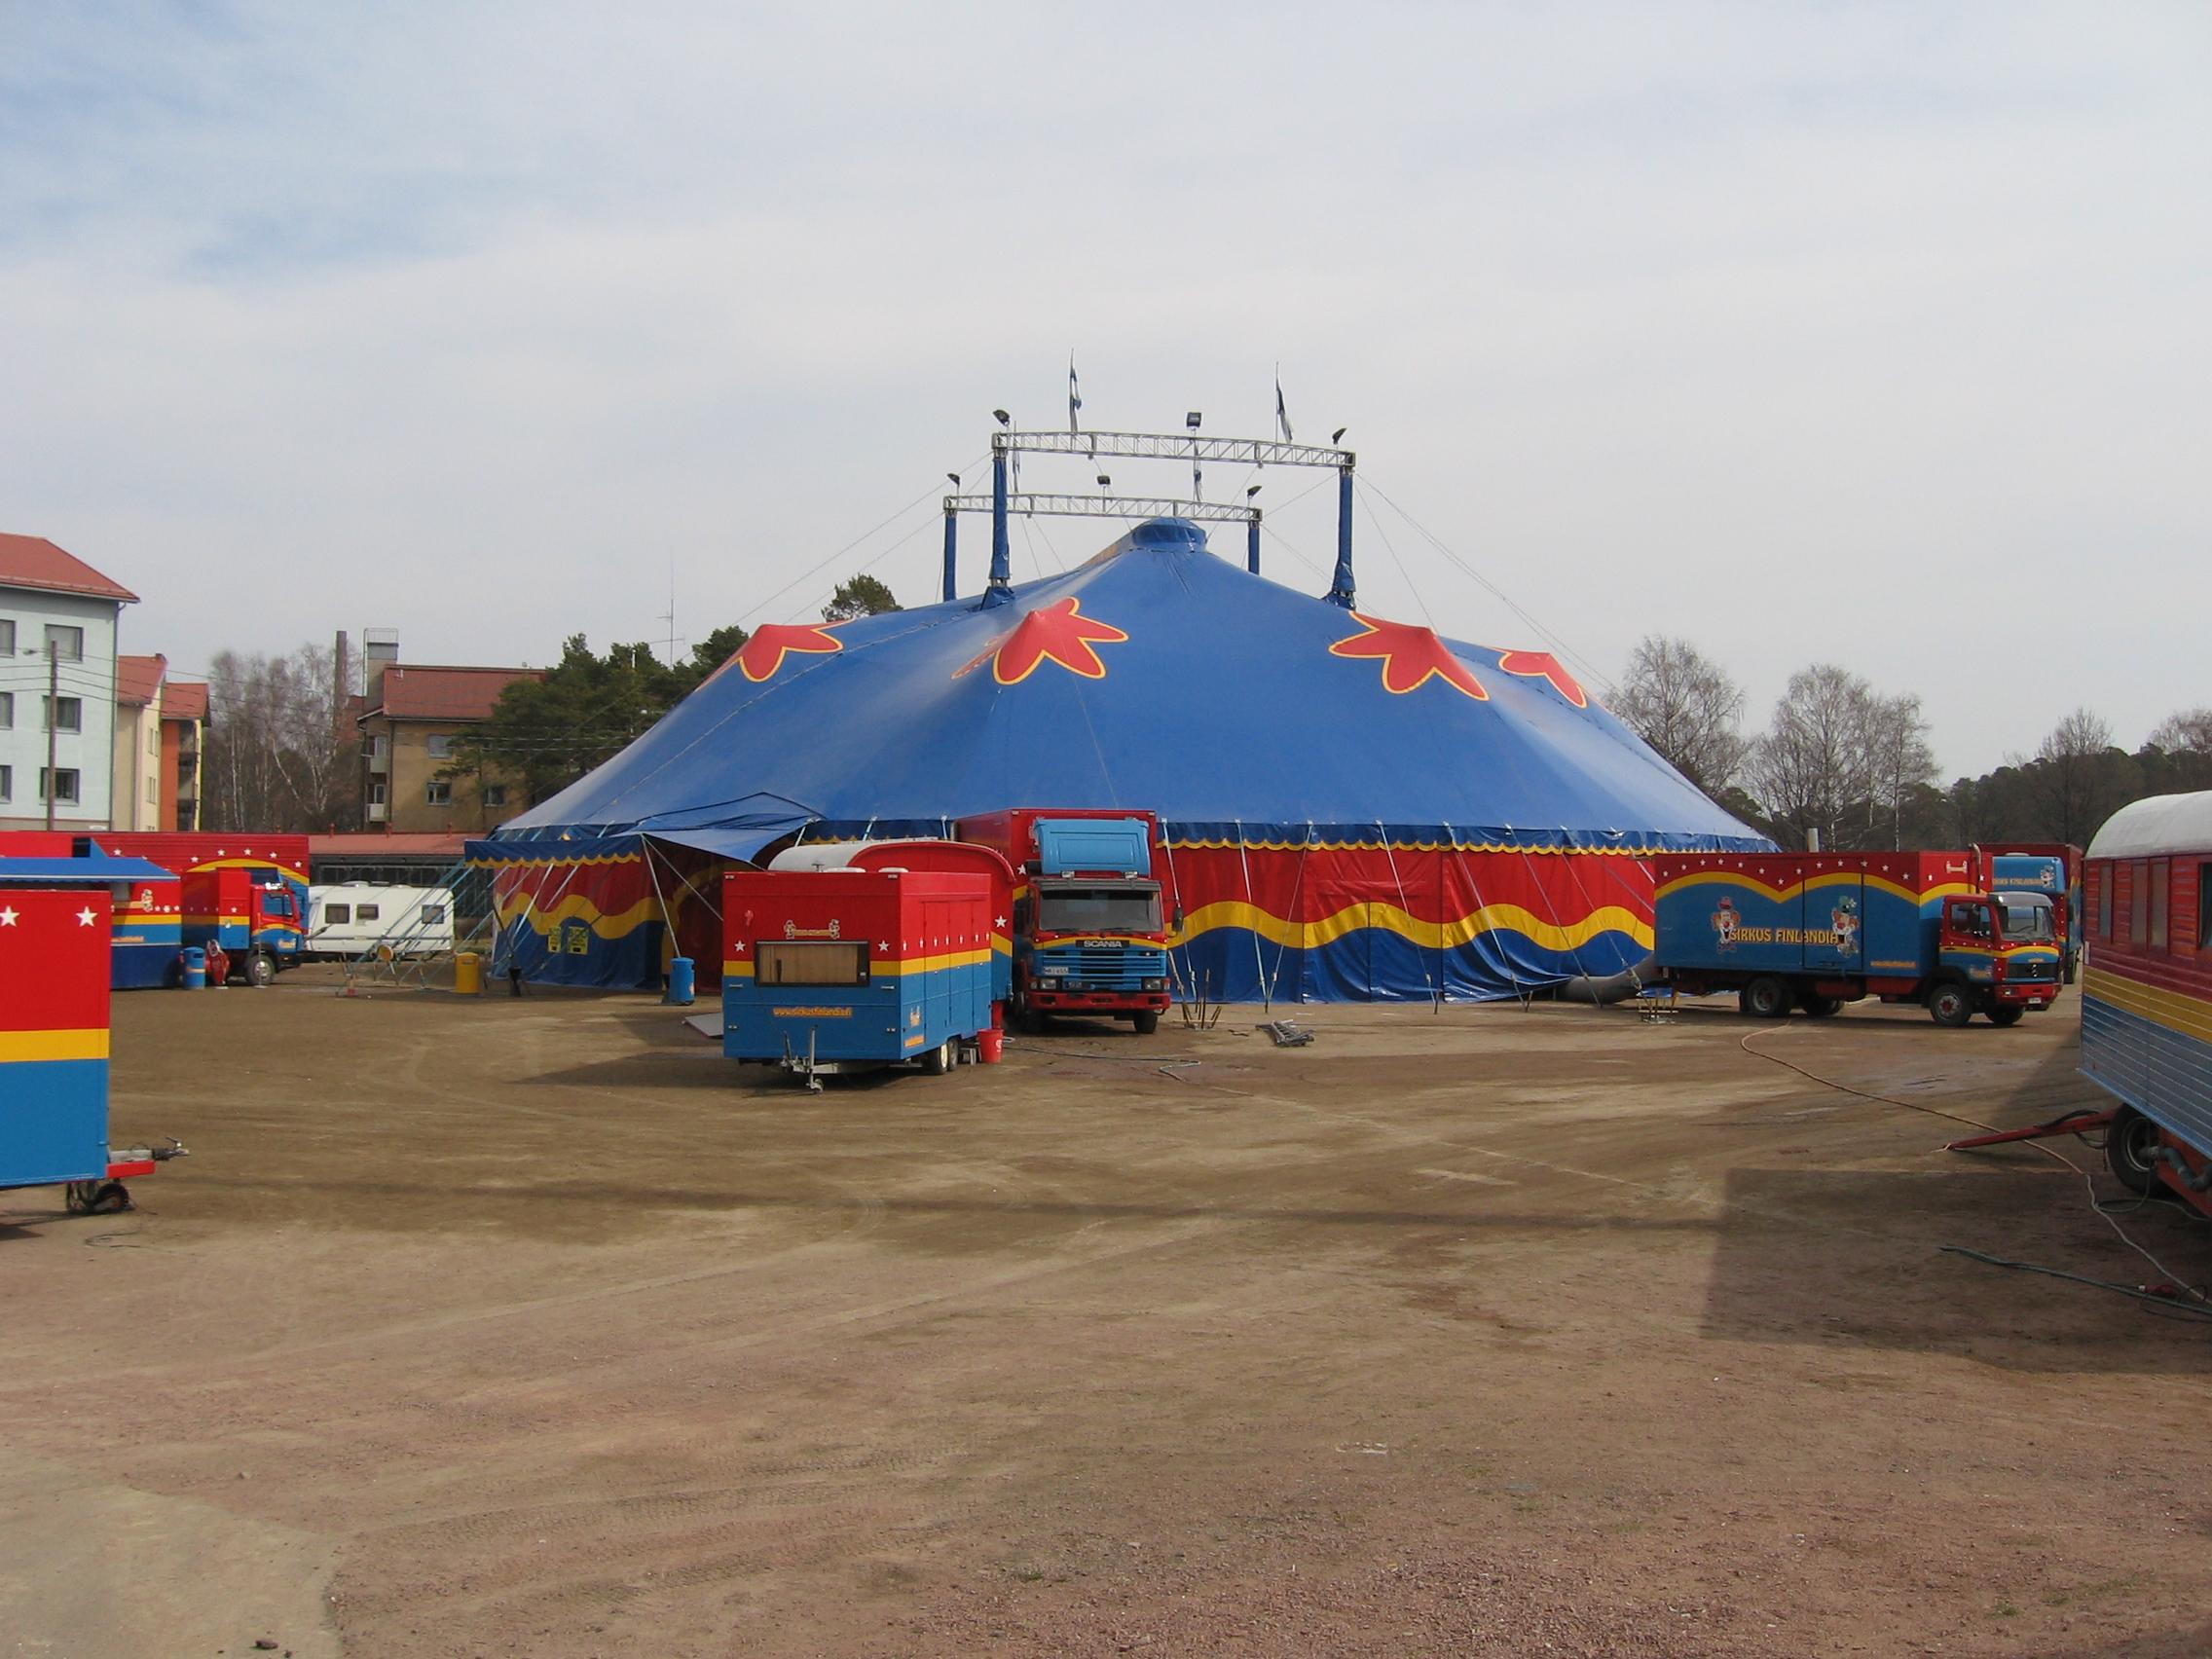 sirkus dating site